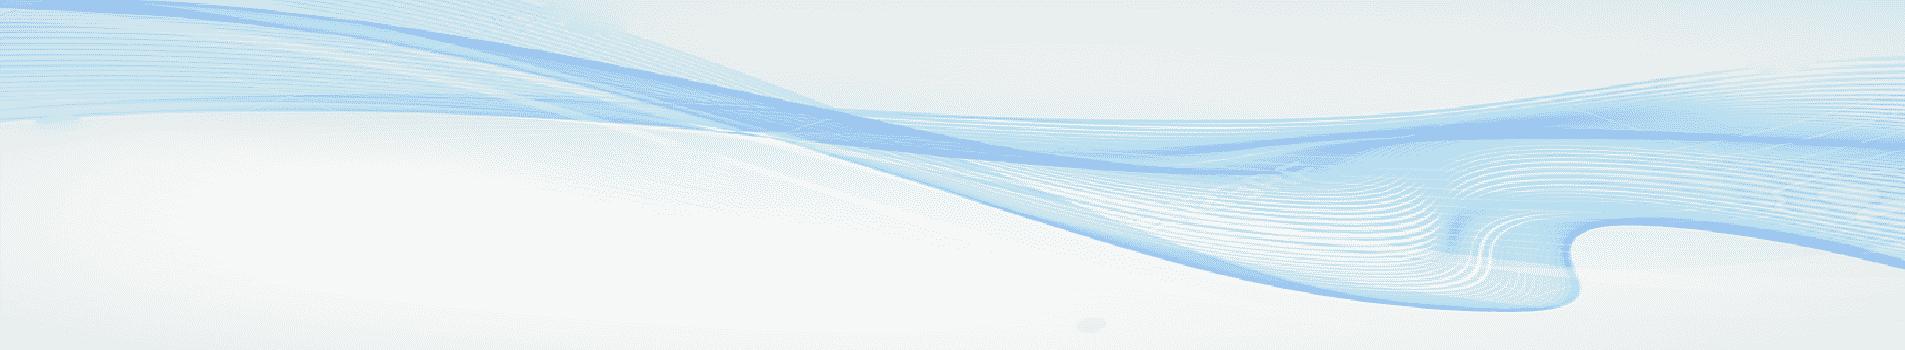 Slide-WHO-Background